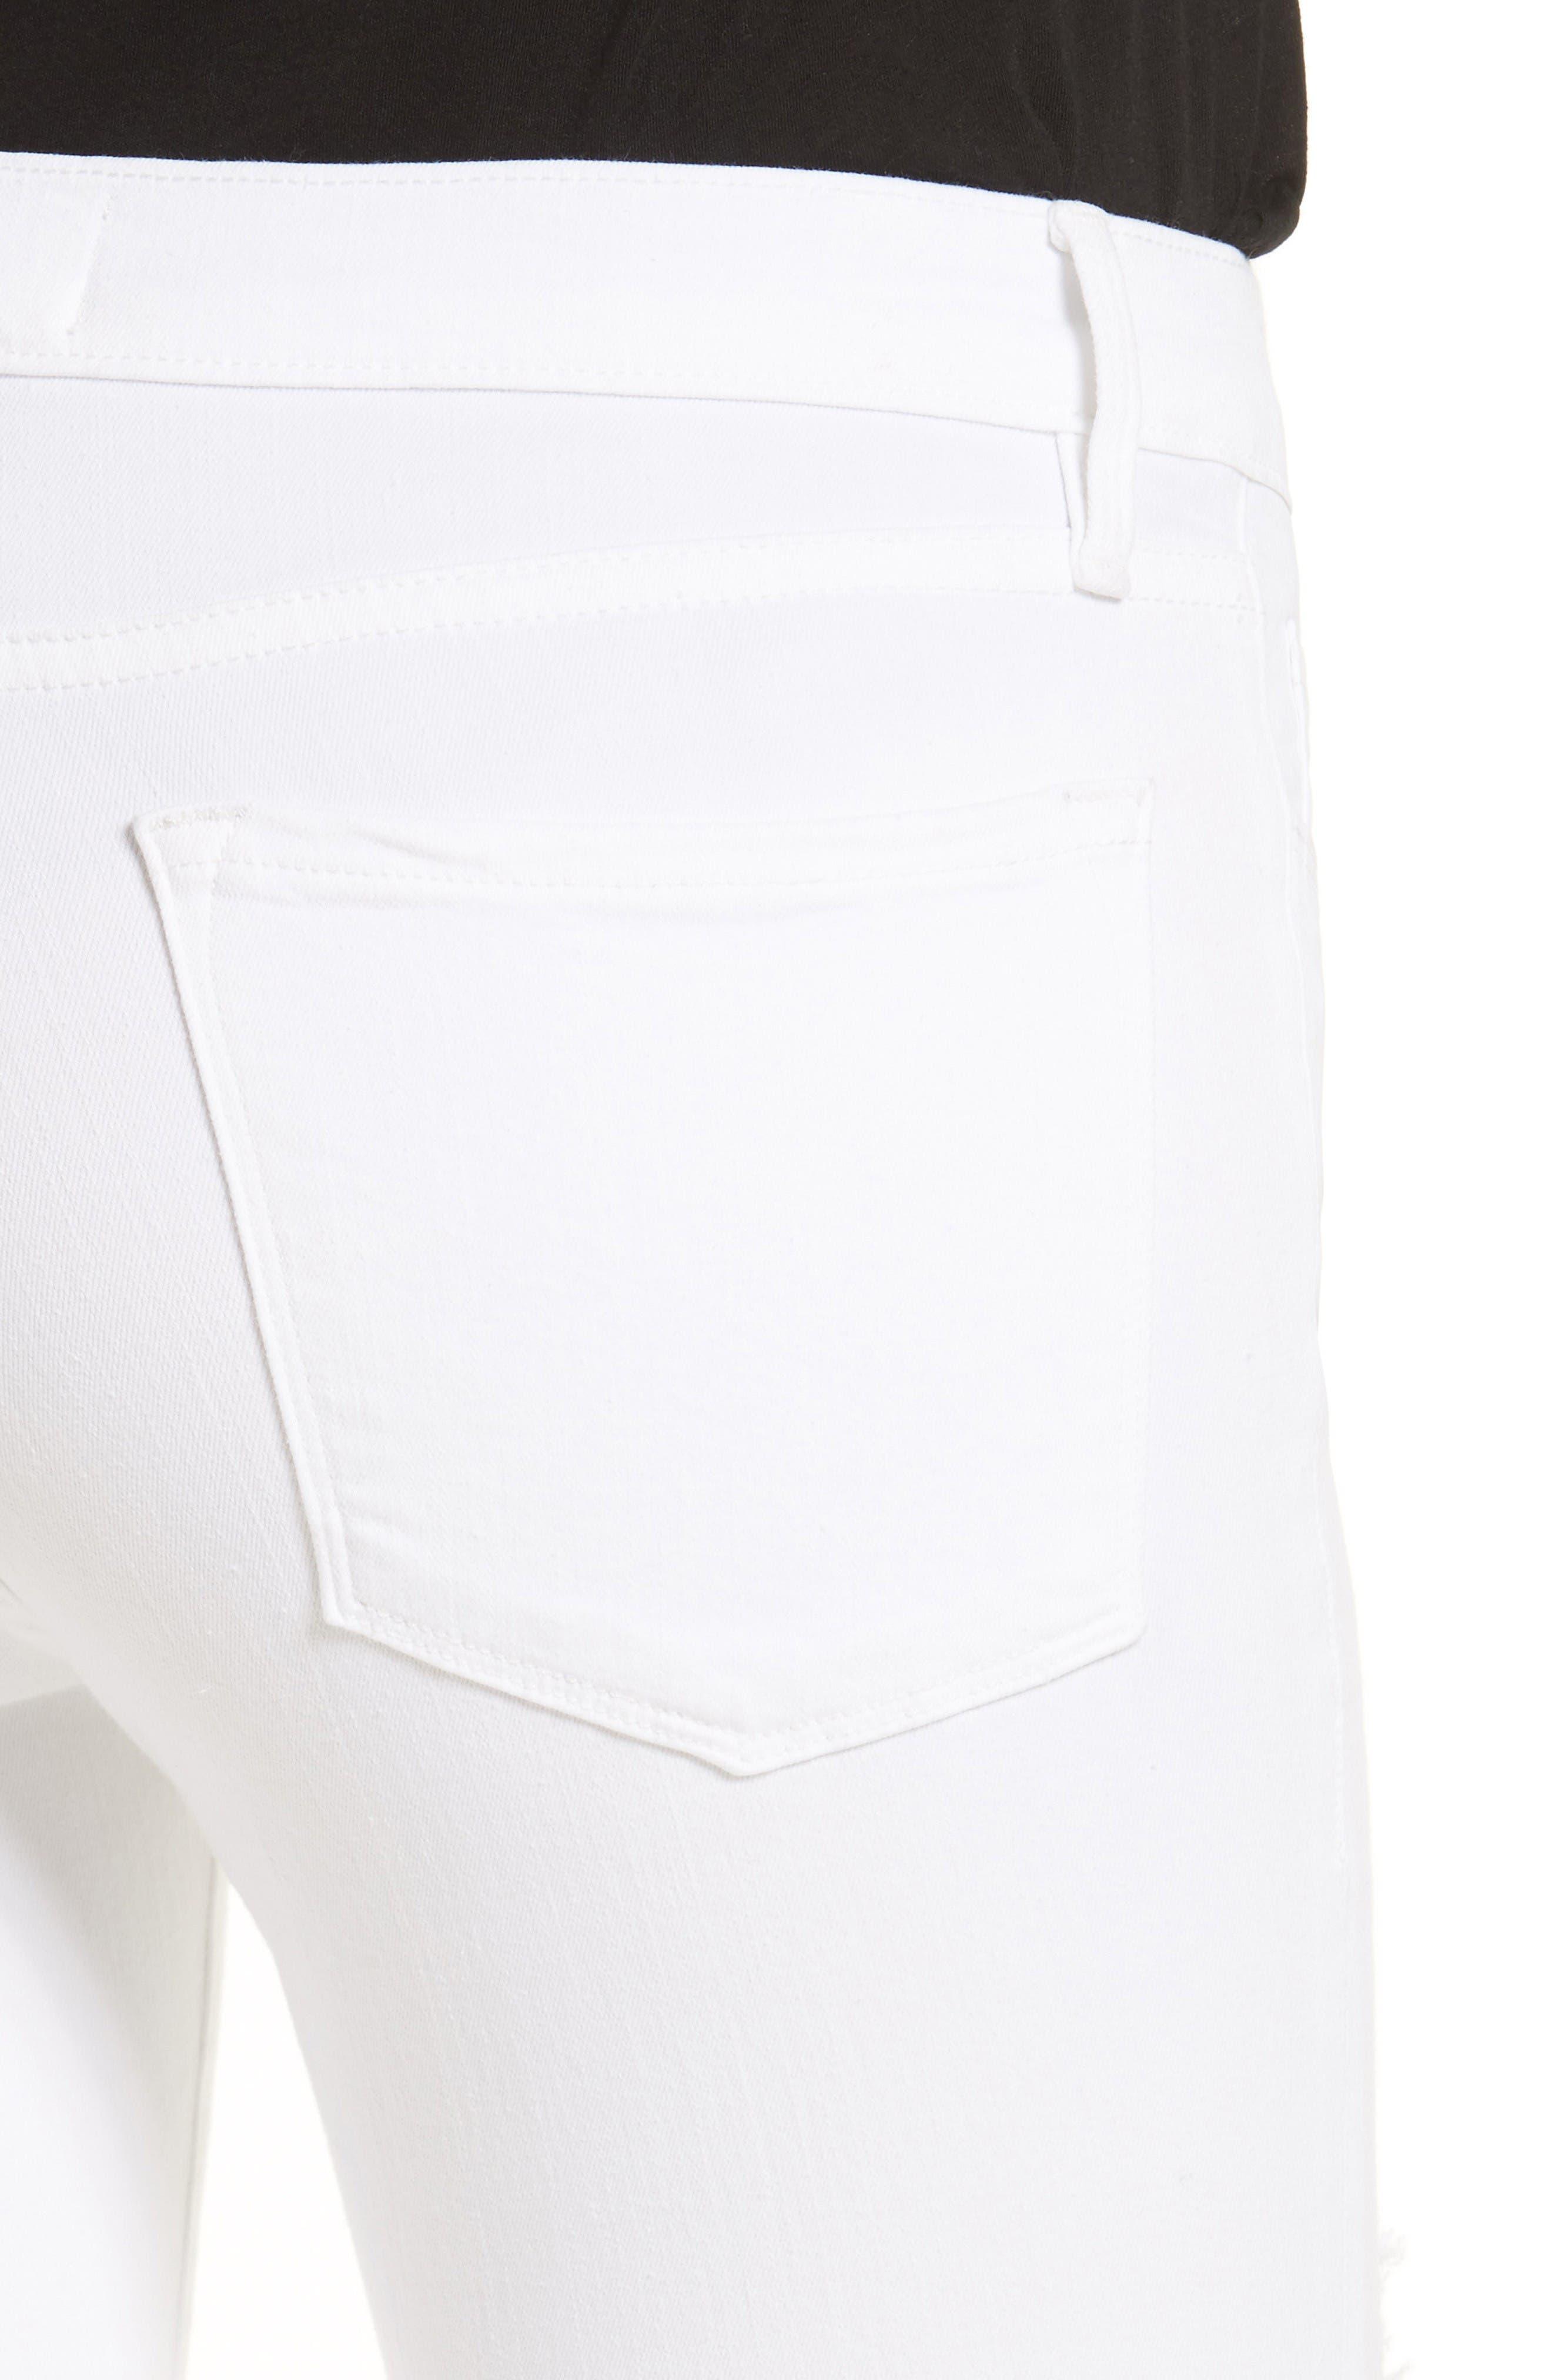 Alternate Image 4  - FRAME 'Le Skinny de Jeanne' Ripped Jeans (Noir Jefferson) (Nordstrom Exclusive)